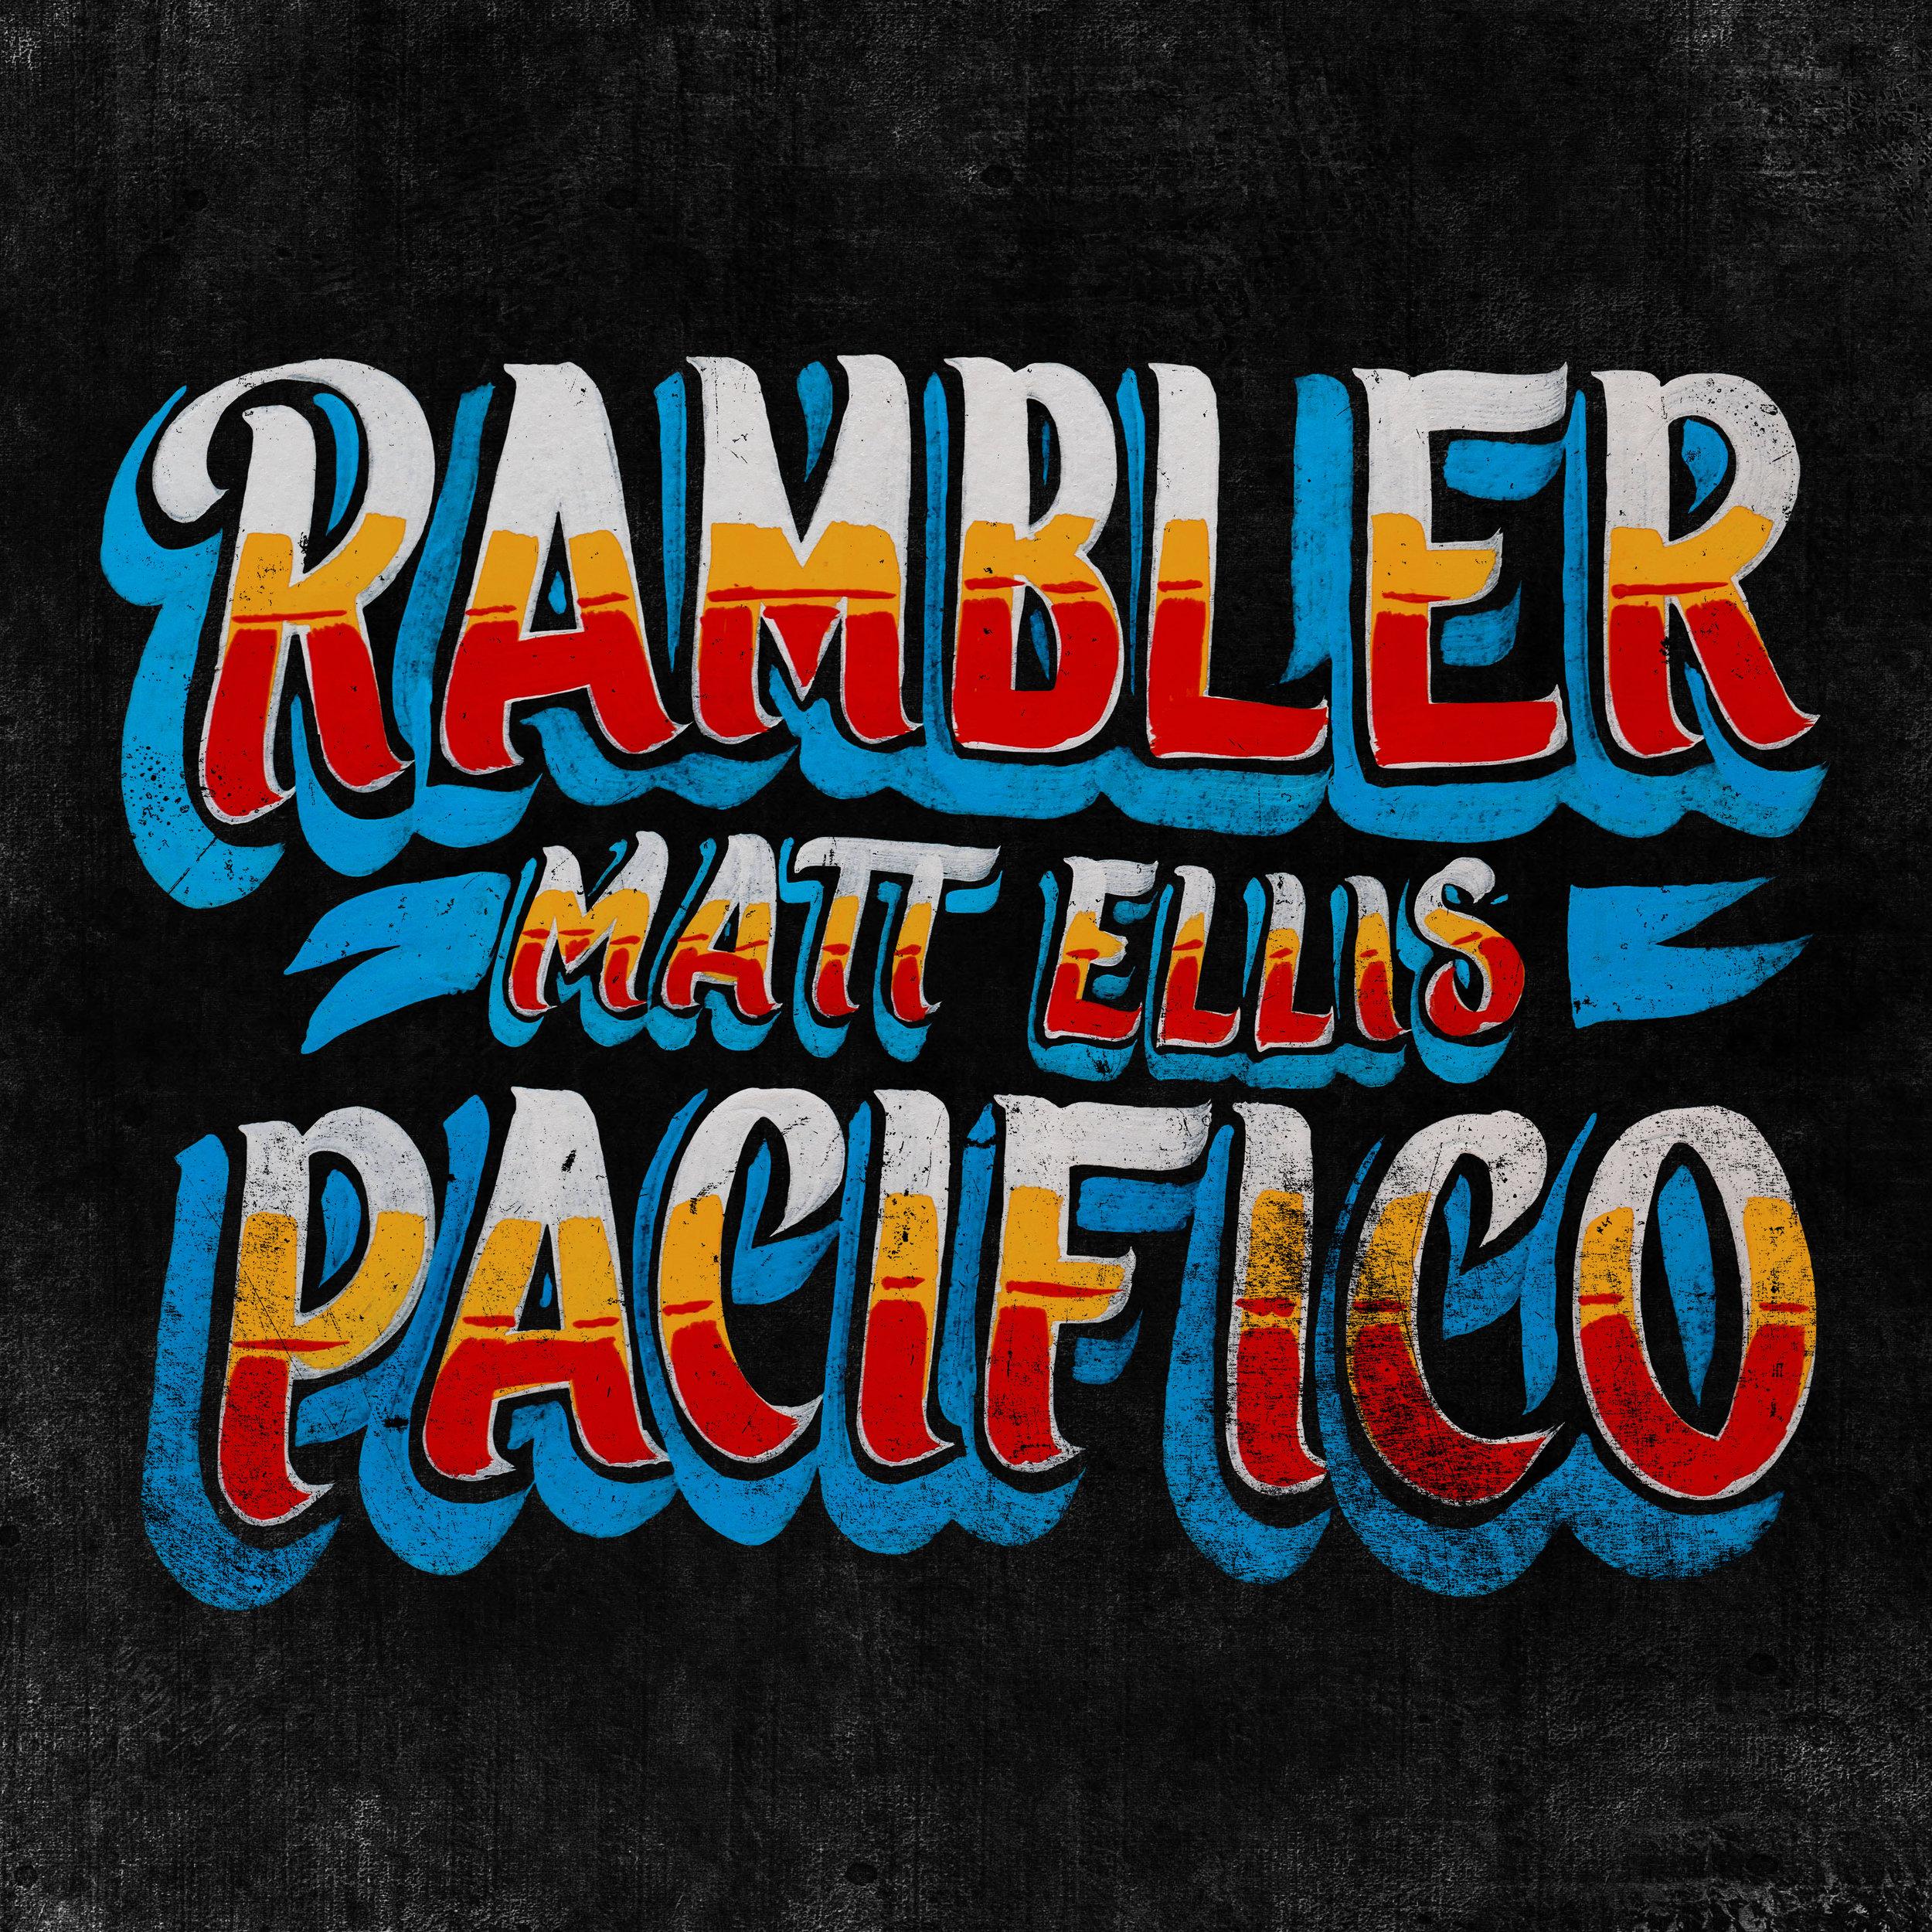 MattEllis_RamblerPacifico.jpg